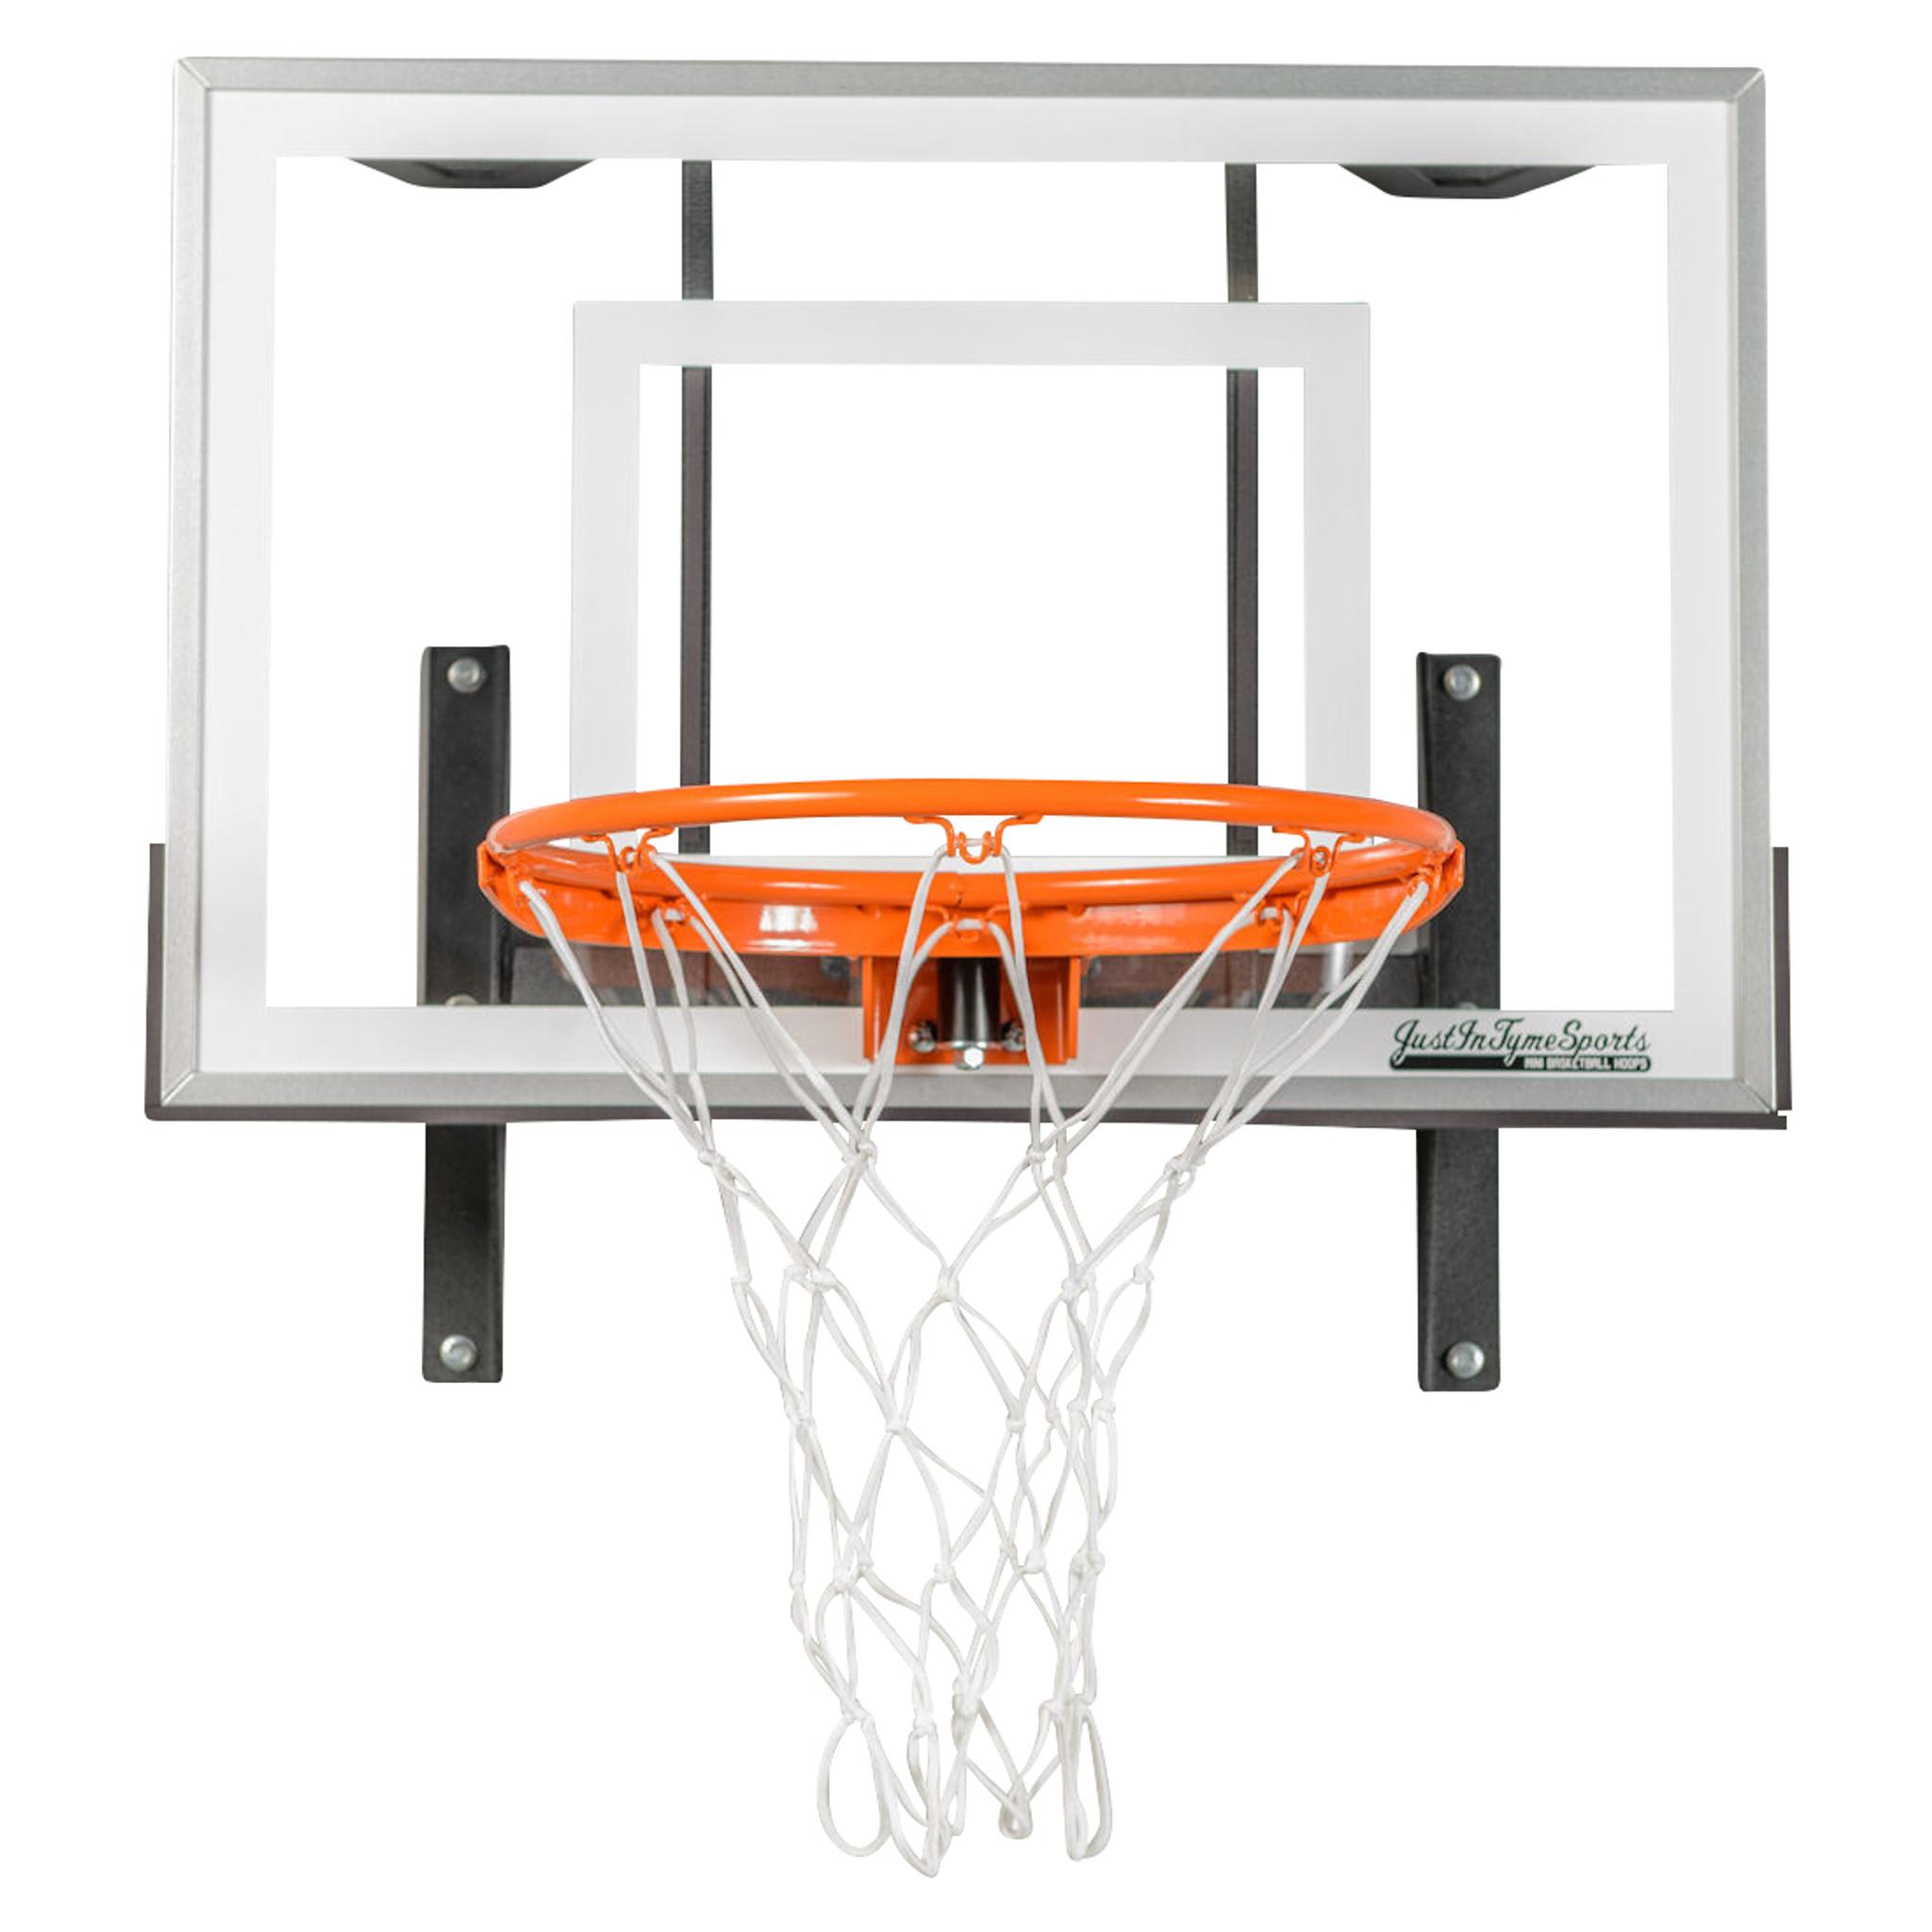 Mini Pro Xtreme Basketball Hoop Set Justintymesports